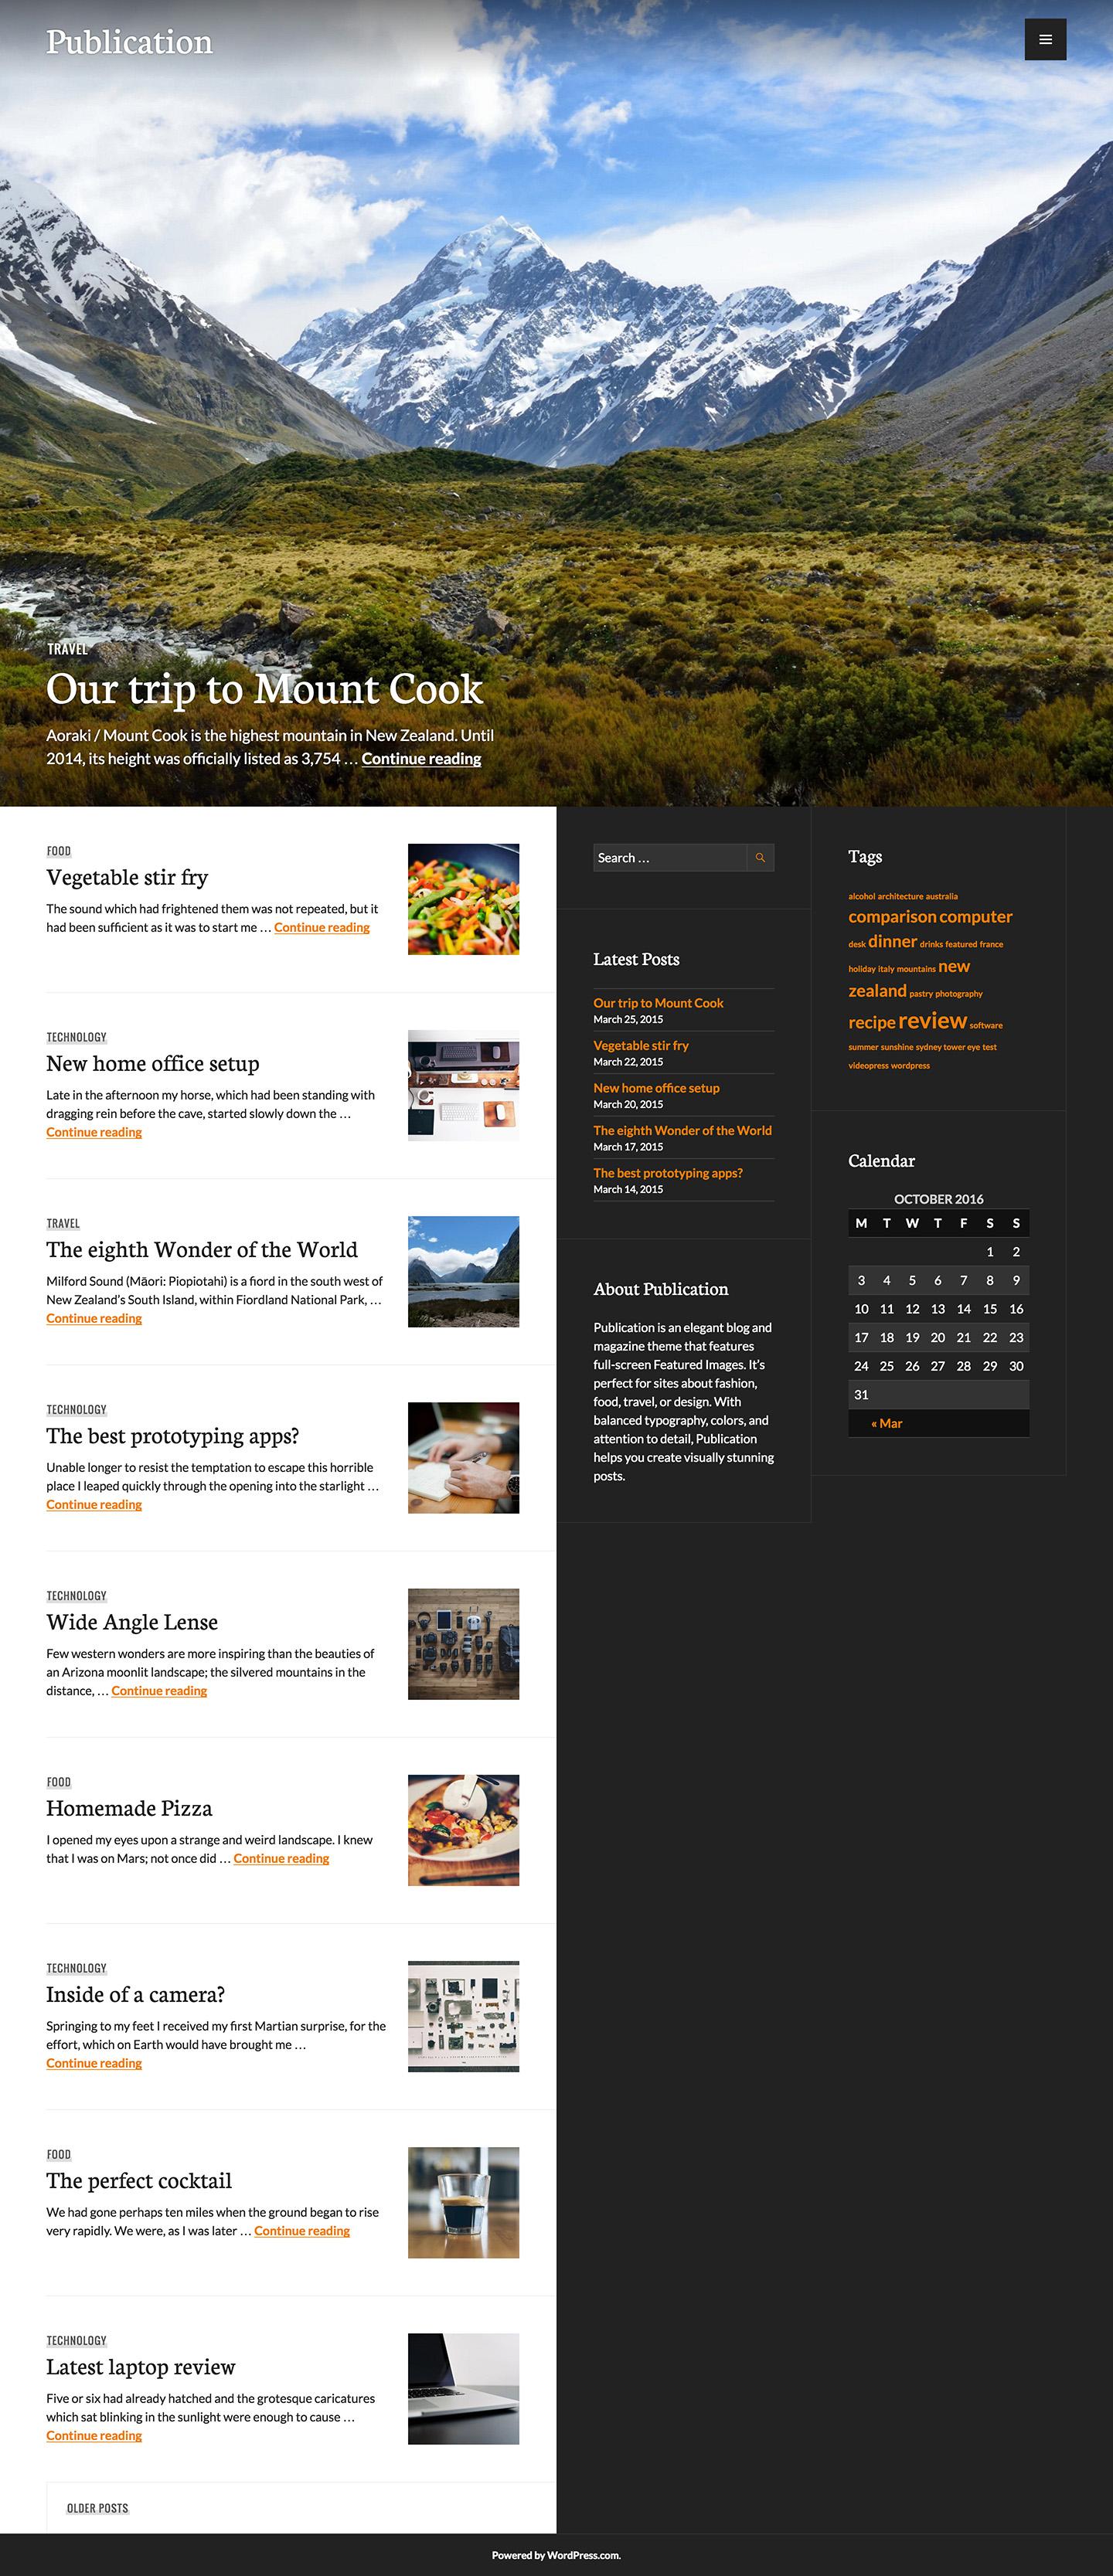 Screenshot of the Publication theme